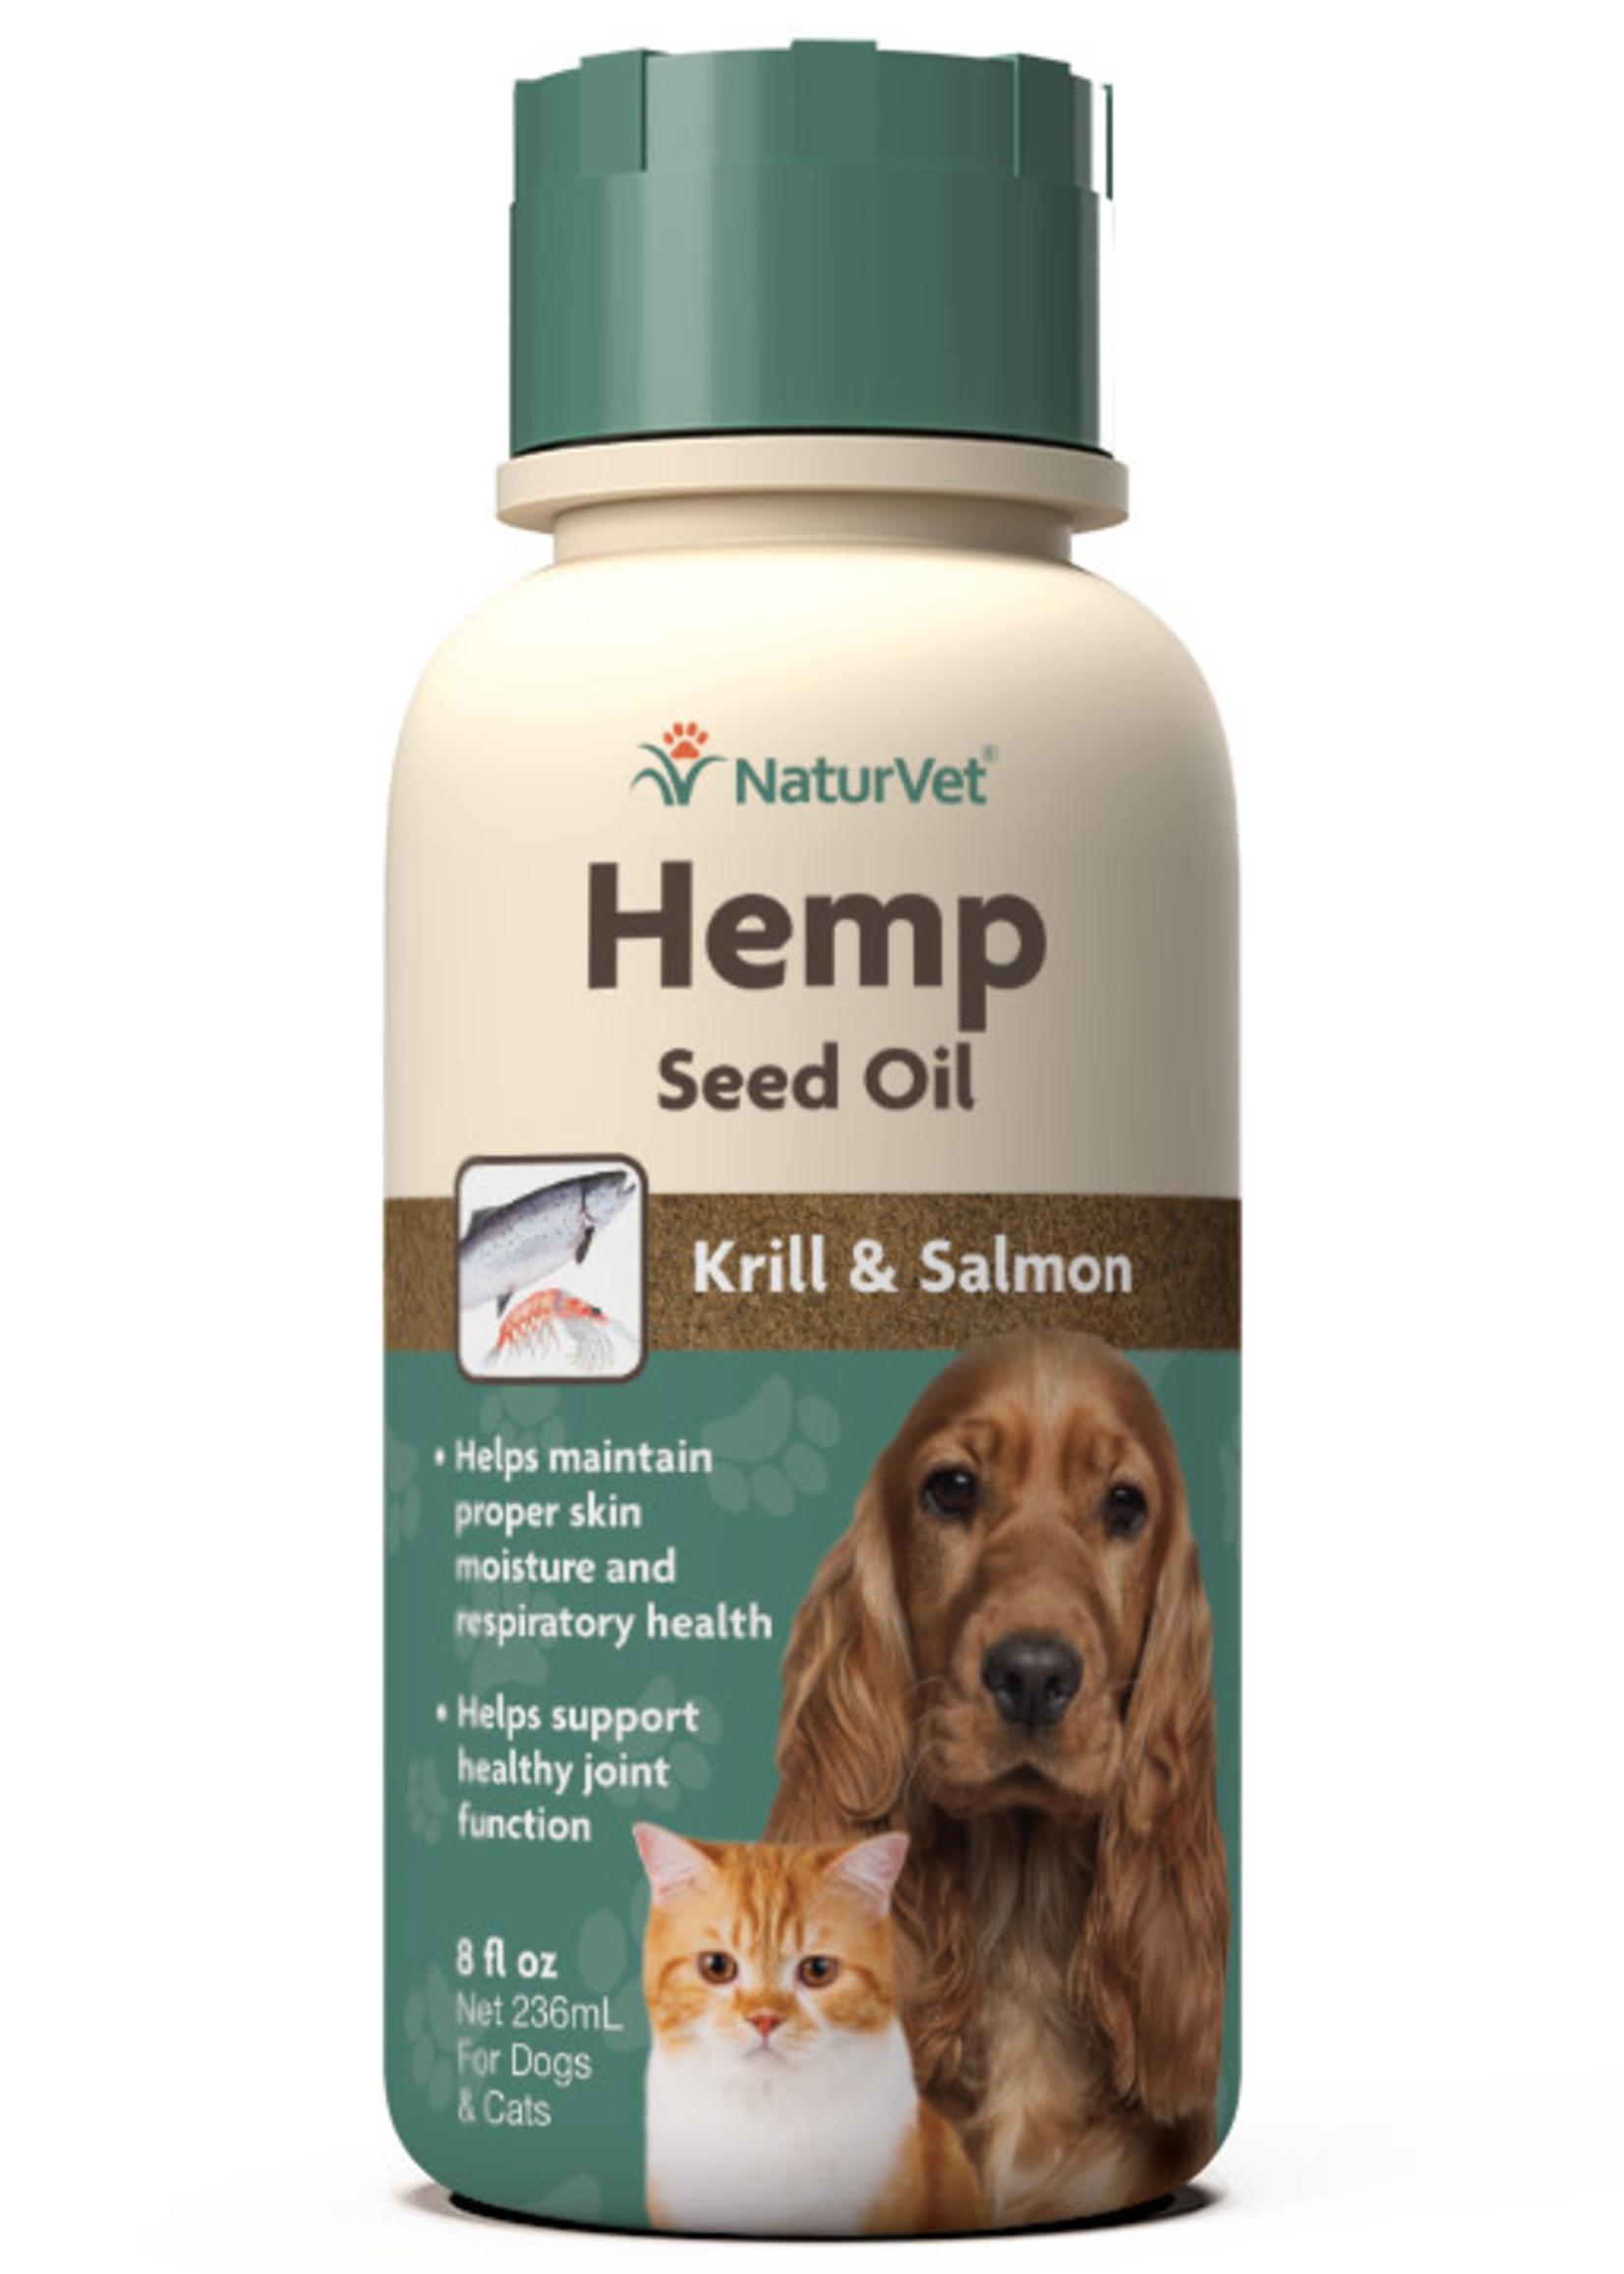 NaturVet NaturVet Cat/Dog Hemp Seed, Krill, & Salmon Oil